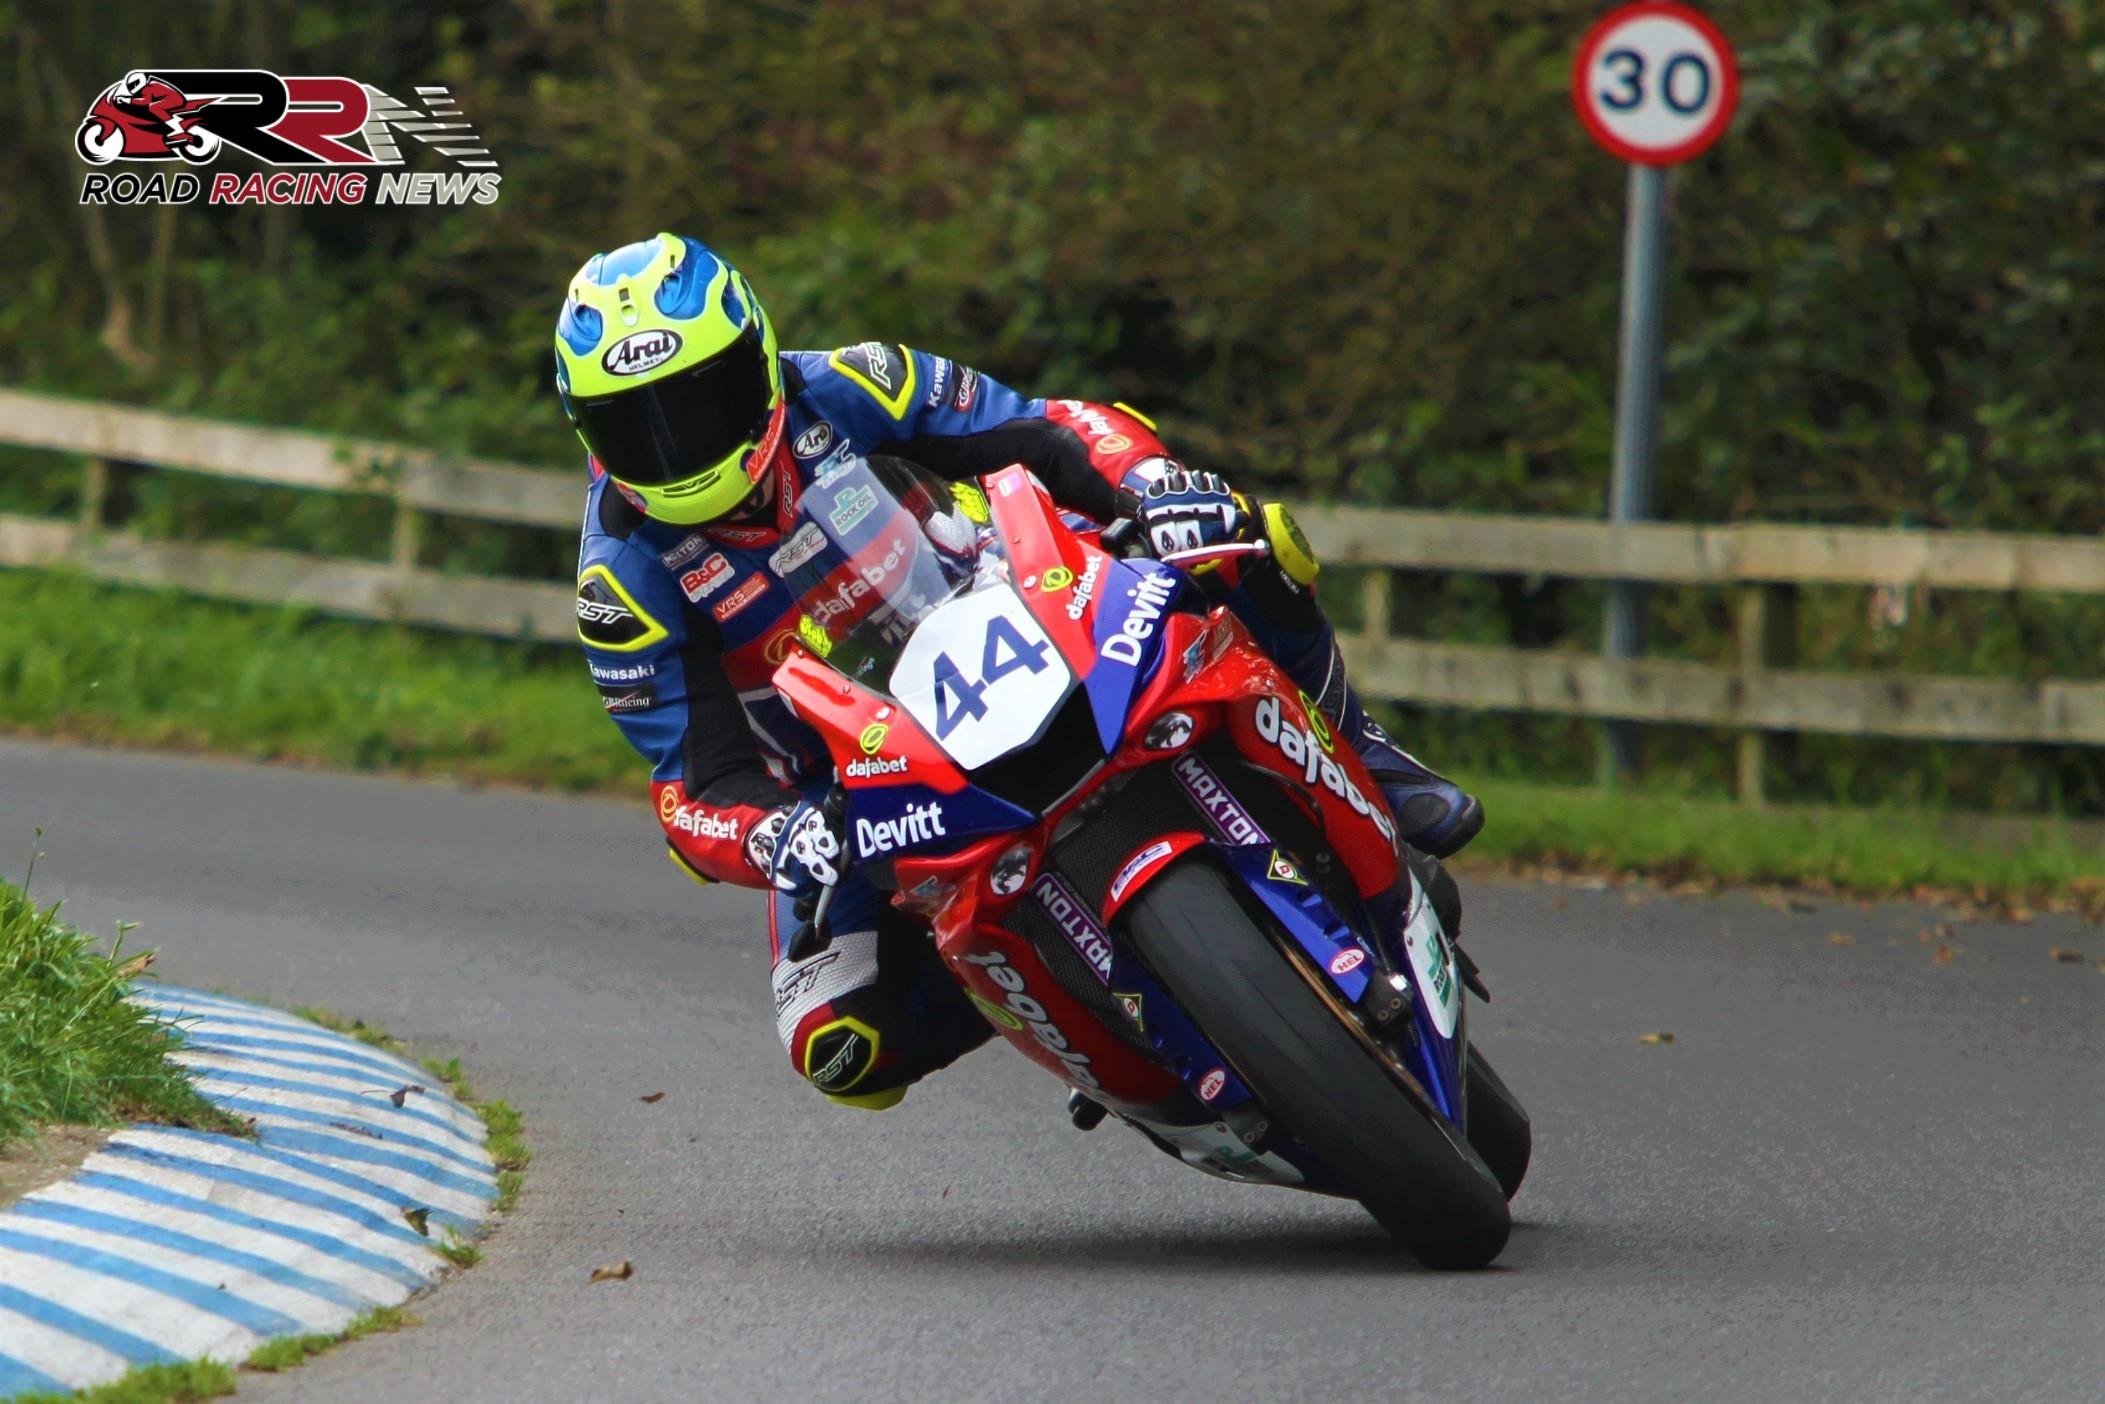 Dafabet Devitt Racing's Hodson Talks Range Of Scarborough Themed Topics